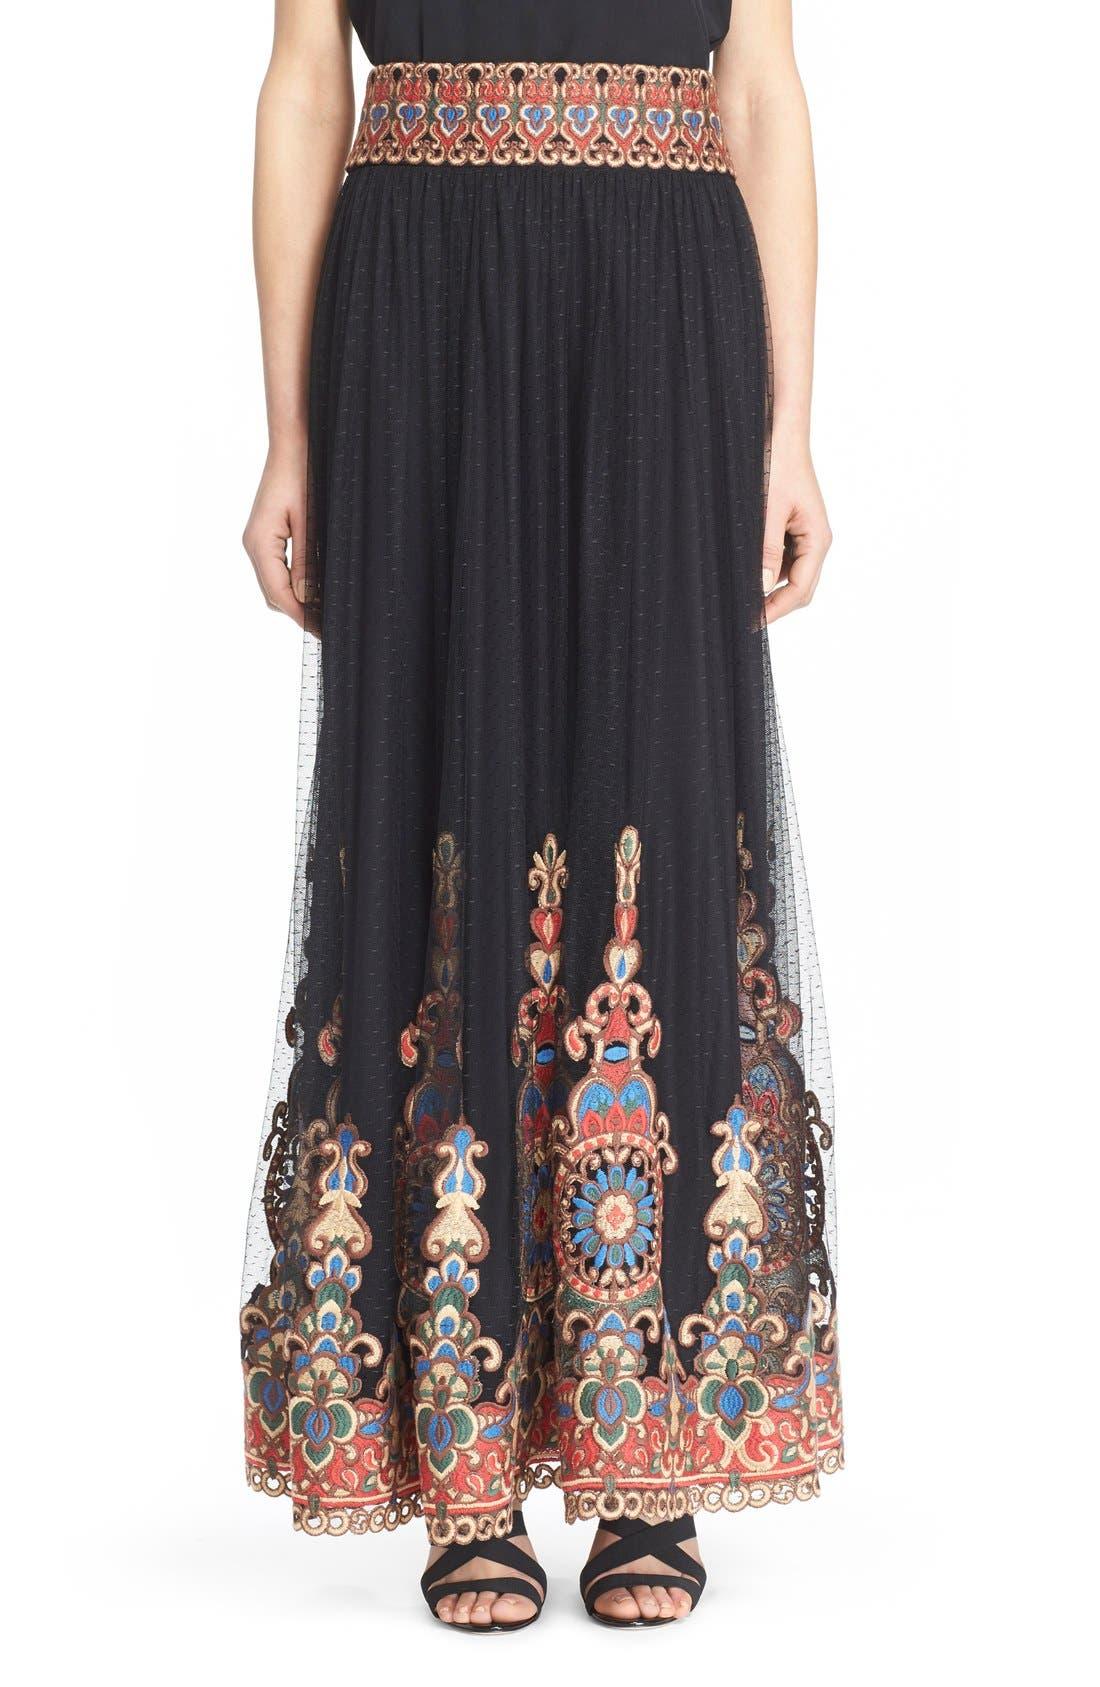 Main Image - Alice + Olivia 'Savanna' Embroidered Maxi Skirt